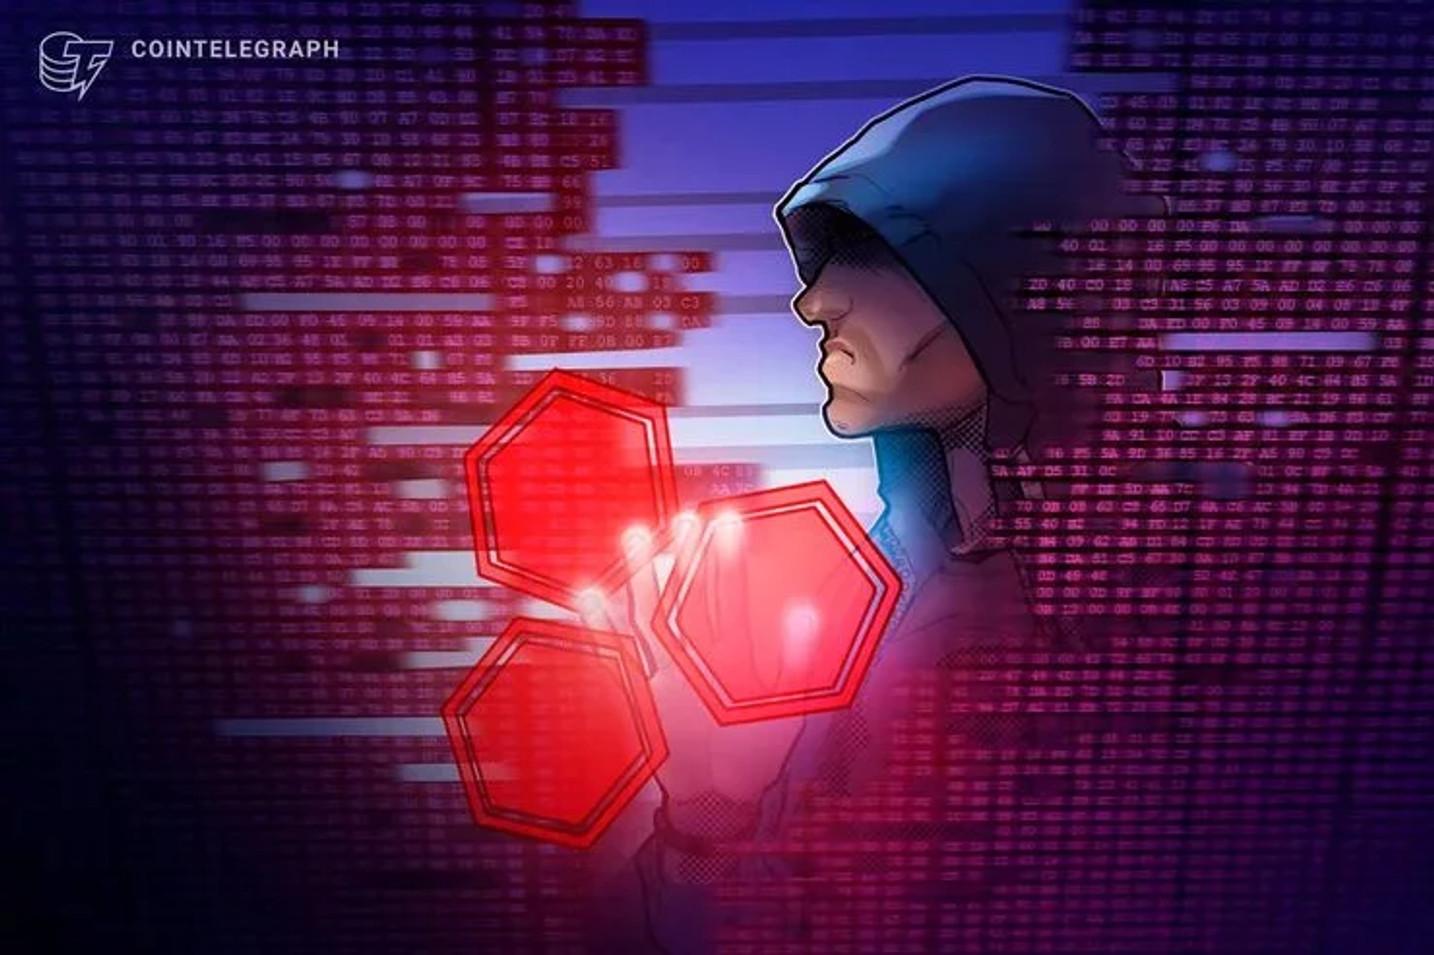 Joab dos Santos da YouXWallet anuncia suspensão de saques por ataque 'hacker', CVM investiga empresa